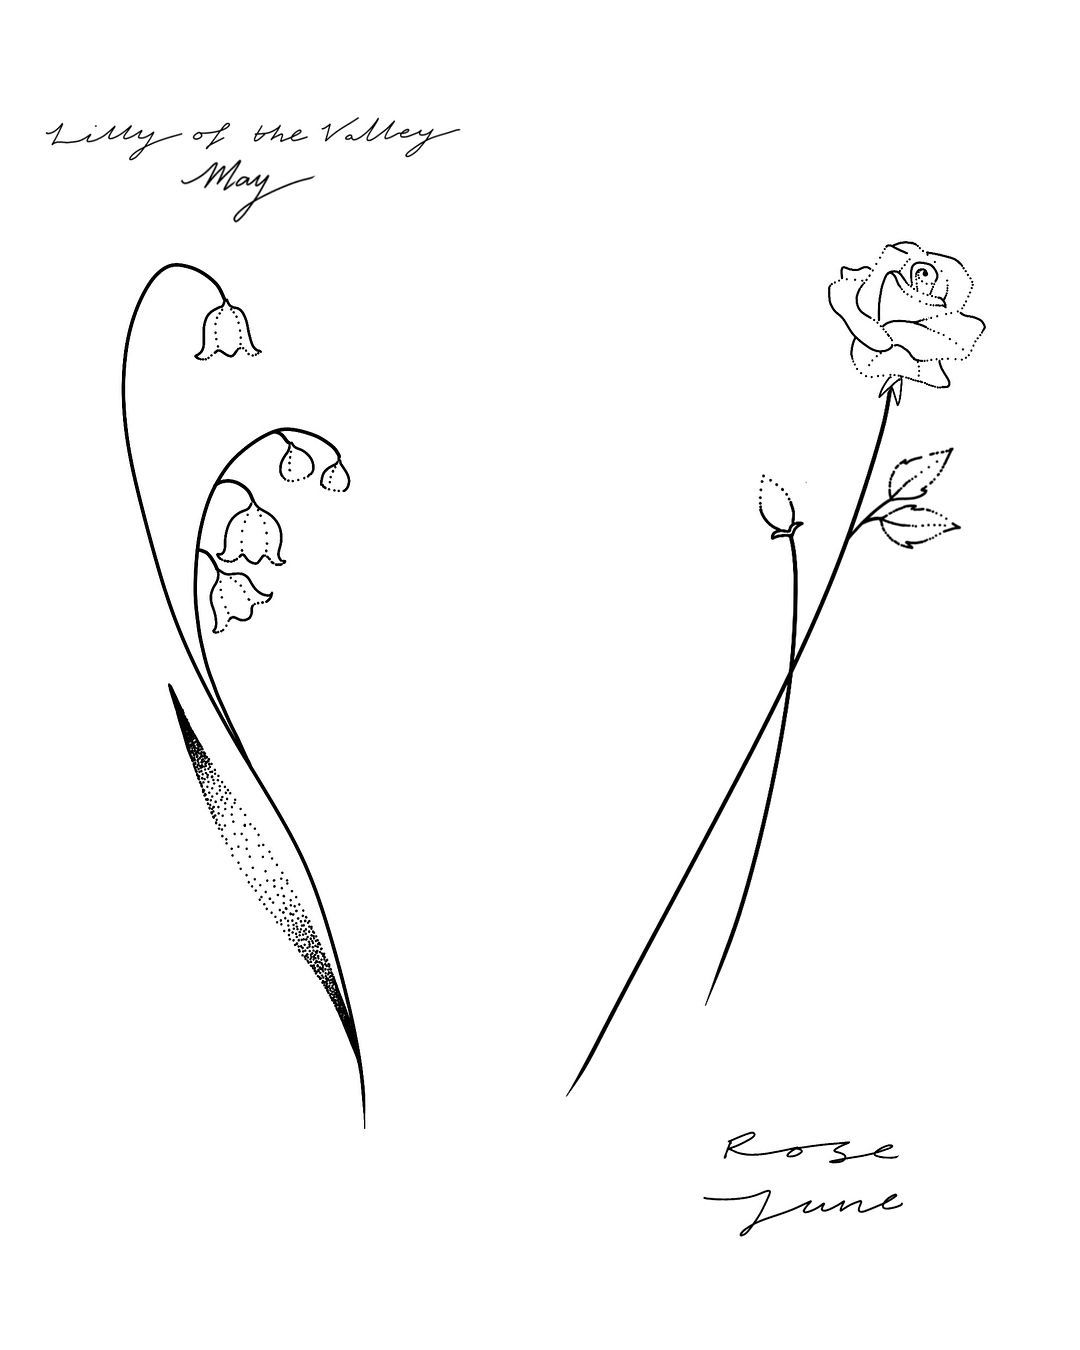 Faye Oliver On Instagram Birth Flower Flash January Snowdrop February Violet March Daffodil April In 2020 Birth Flower Tattoos Birth Flowers Gladiolus Tattoo